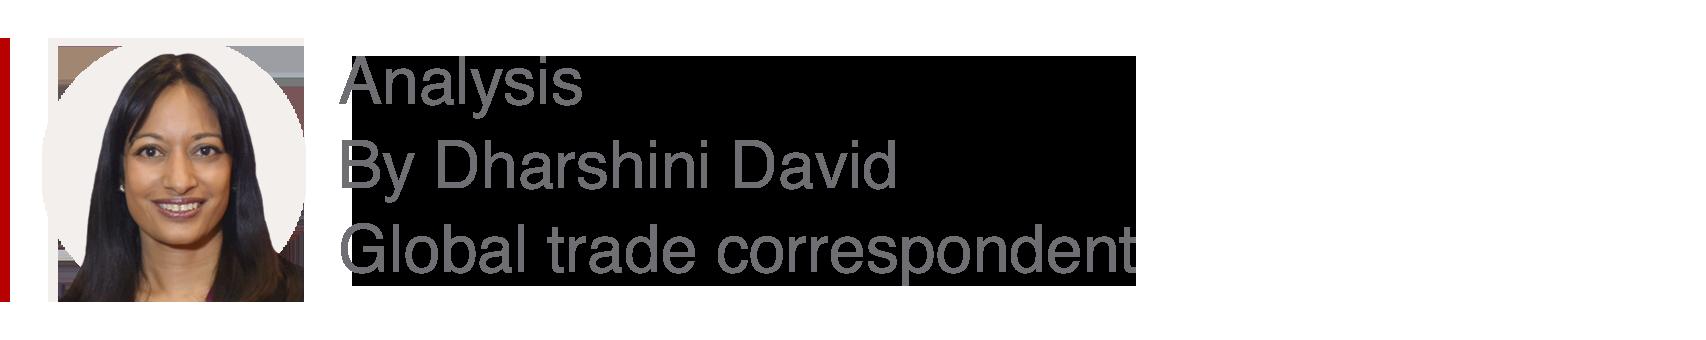 Analysis box by Dharshini David, global trade correspondent